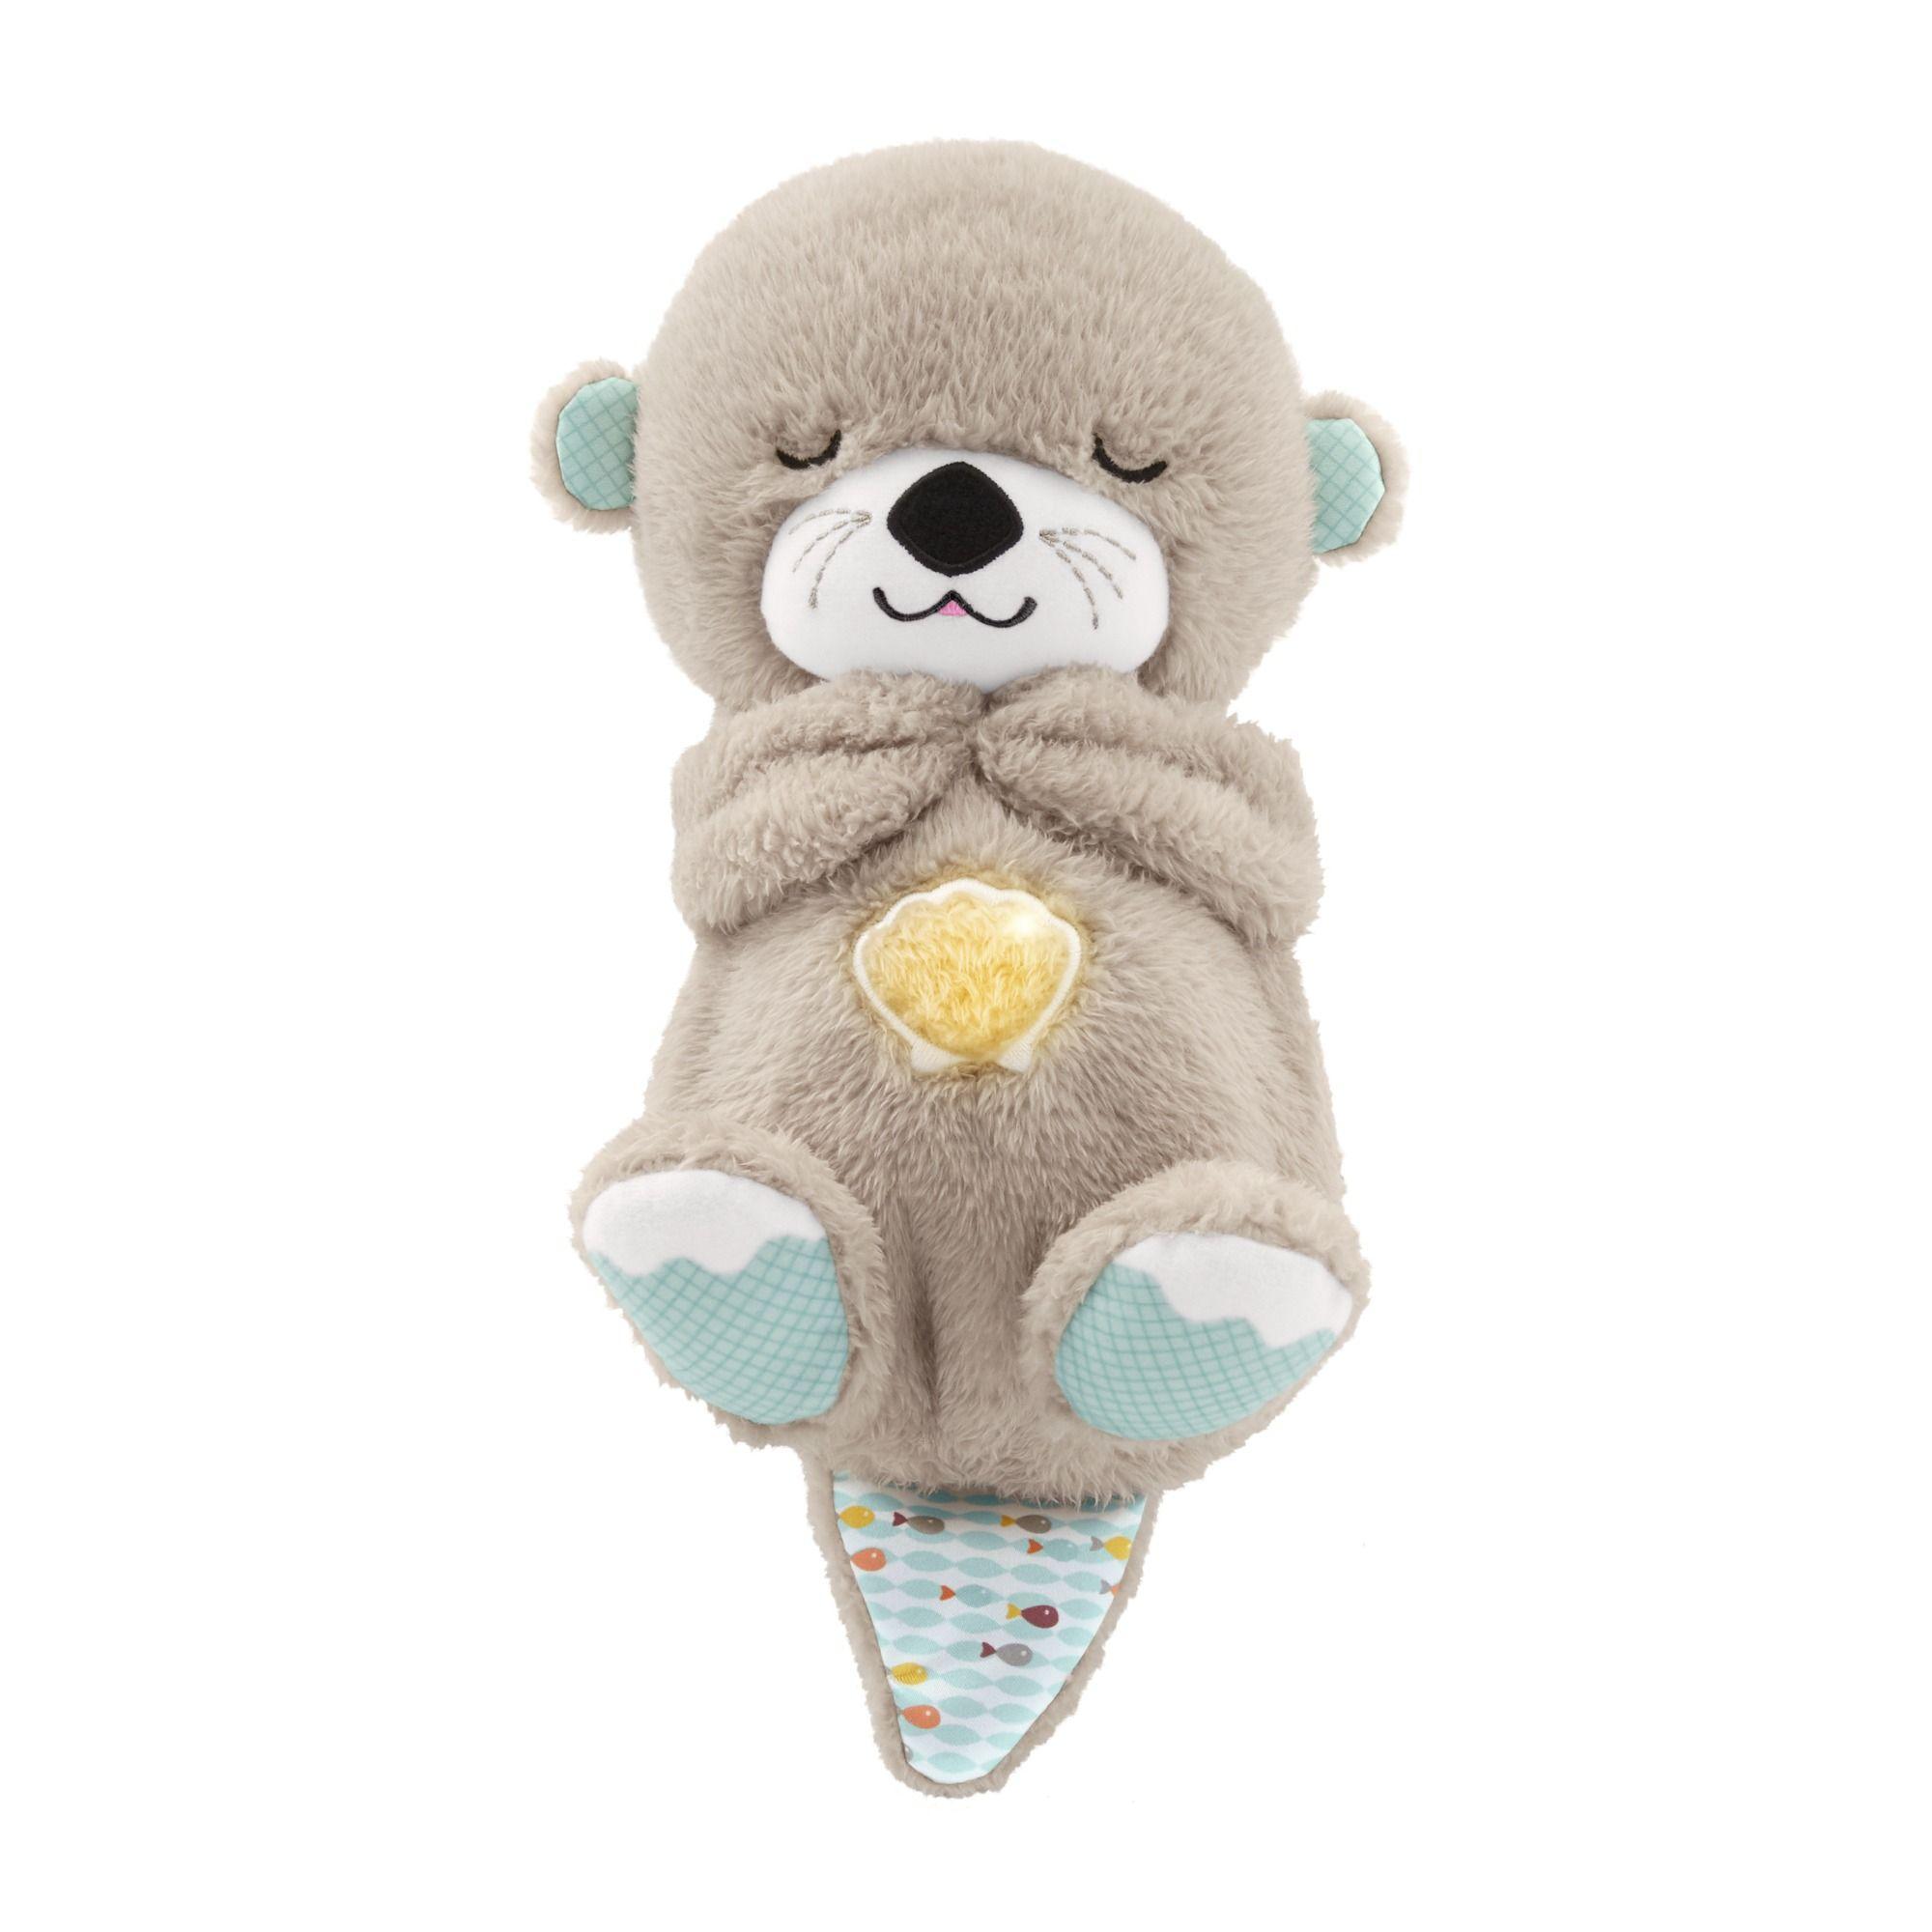 Toys Baby activity toys, Baby sensory toys, Fisher price